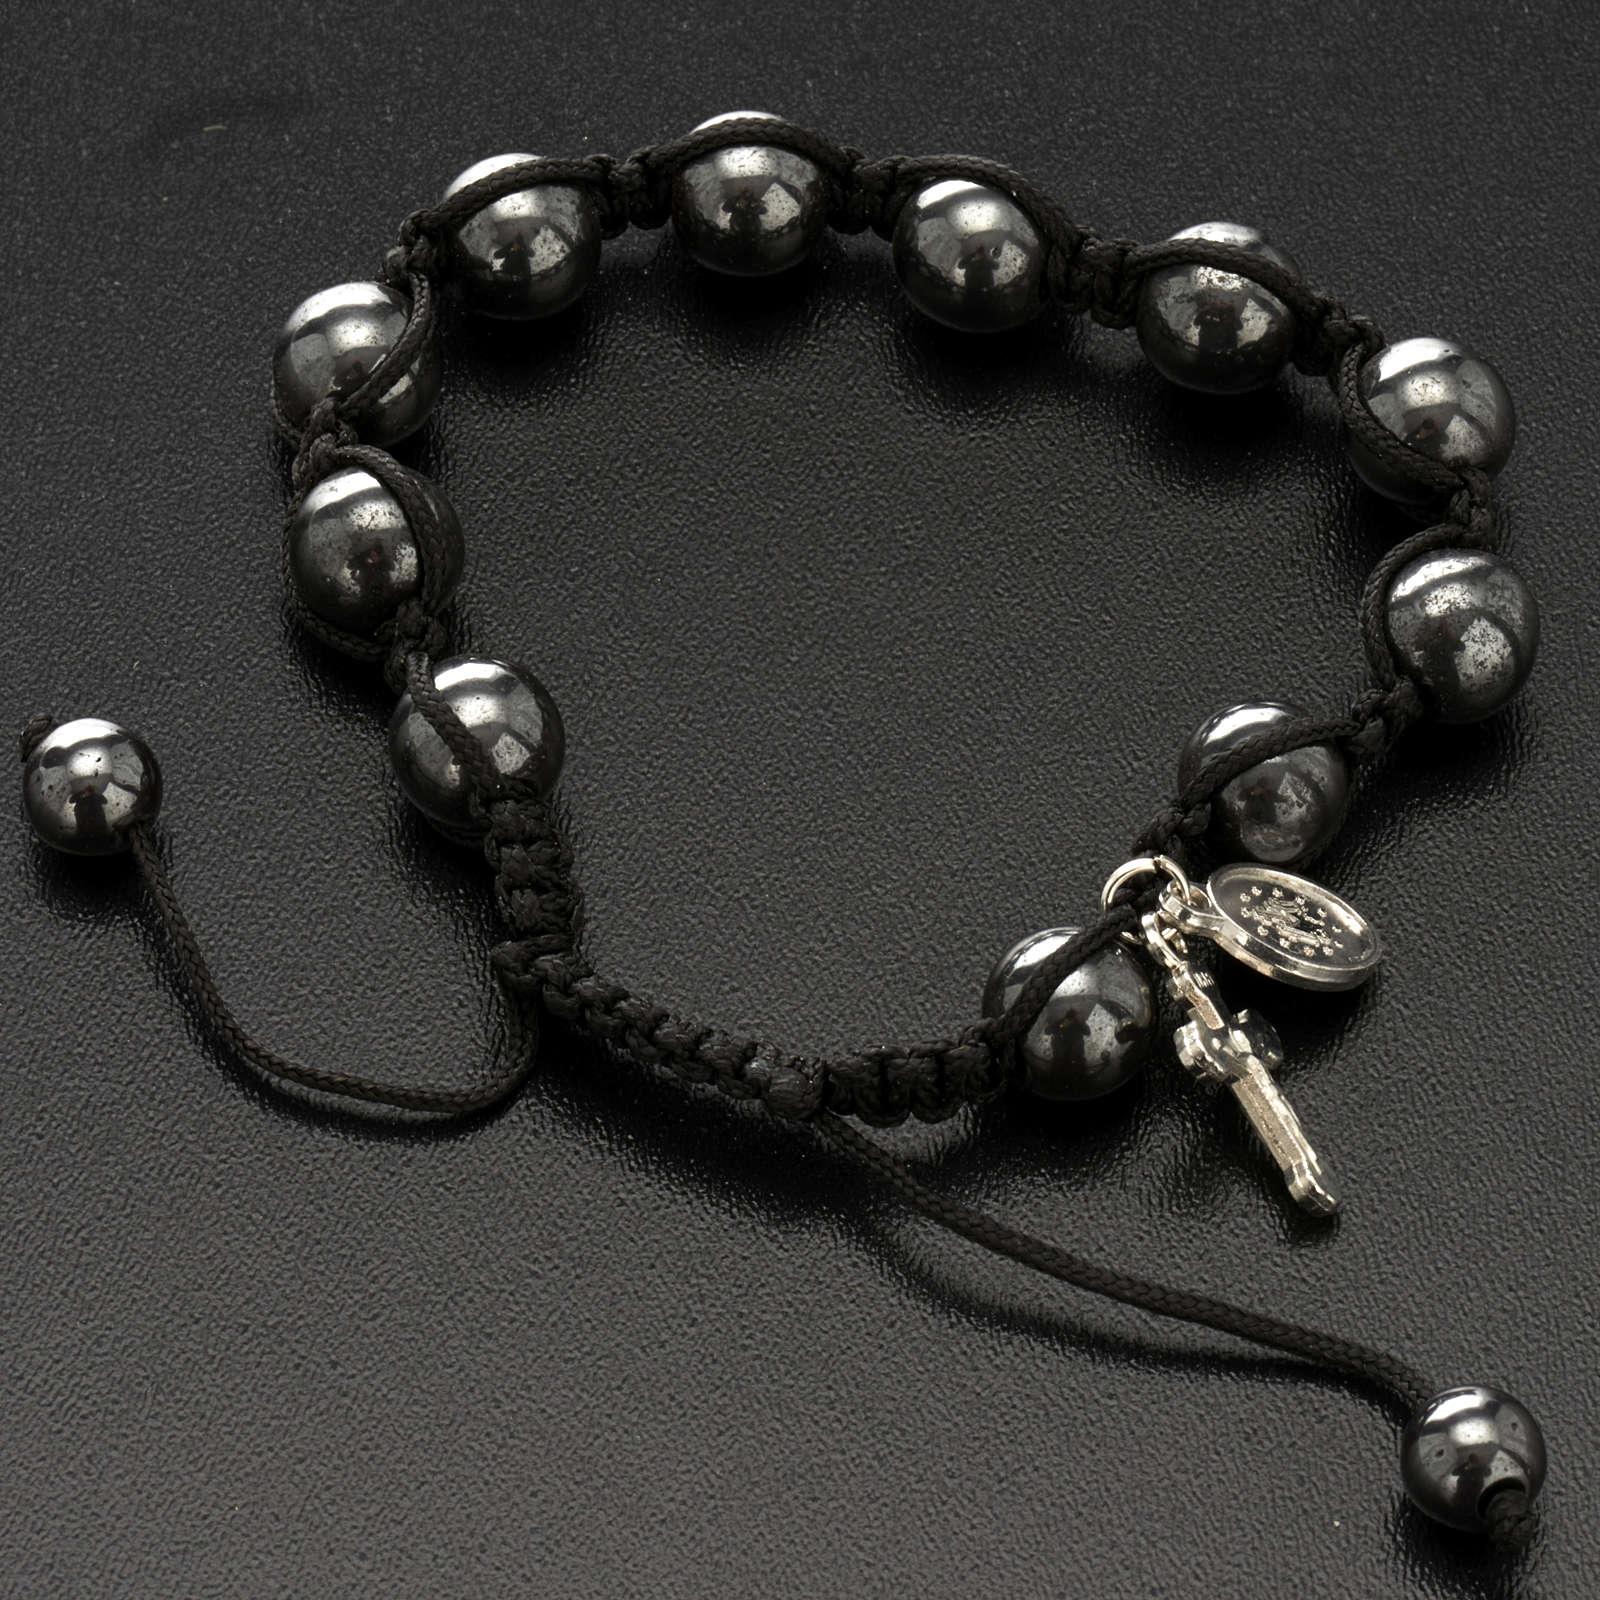 Hematite bracelet 4